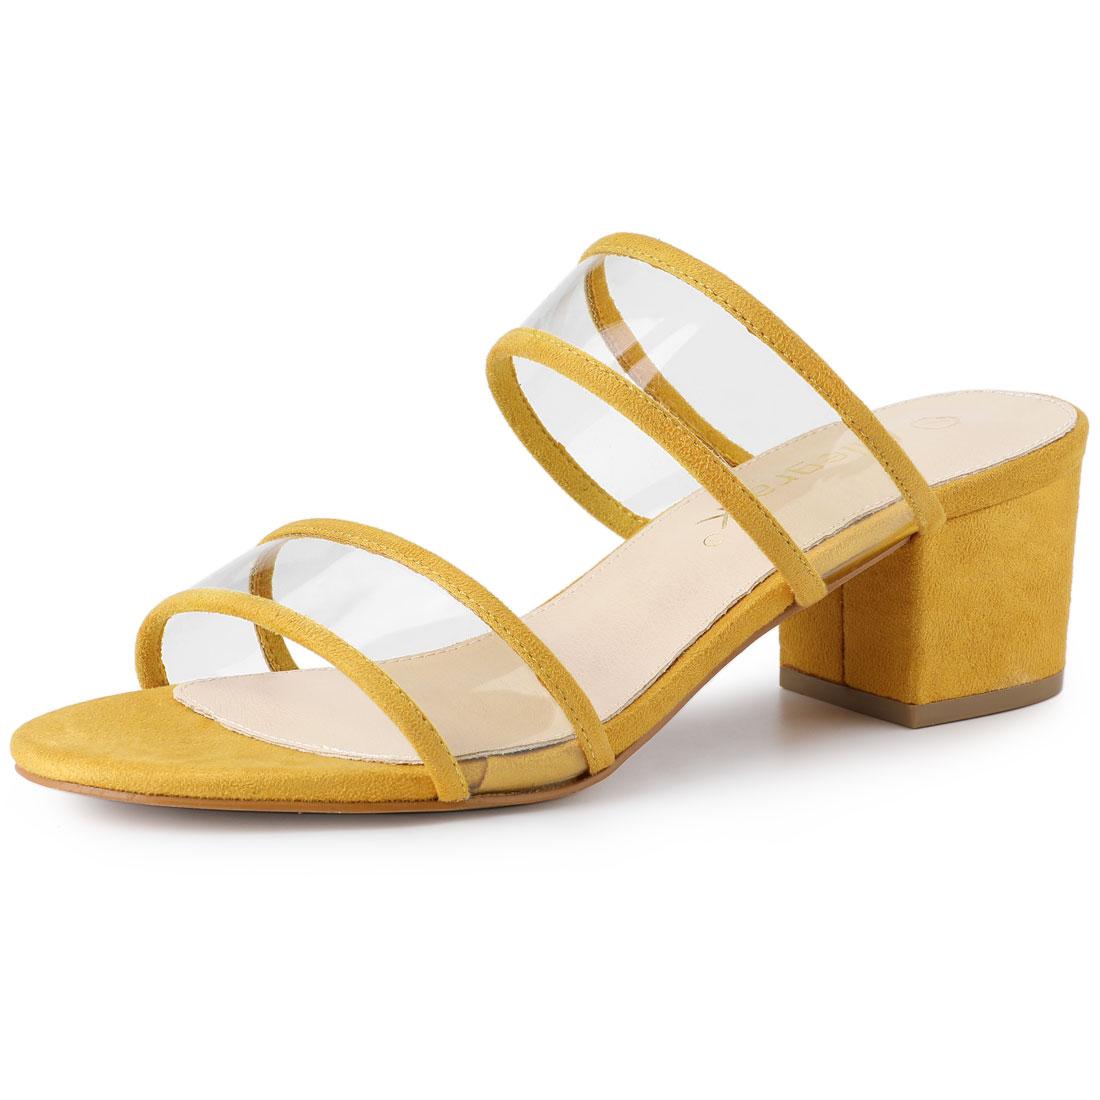 Allegra K Women's Clear Strap Block Heel Slide Sandals Yellow US 9